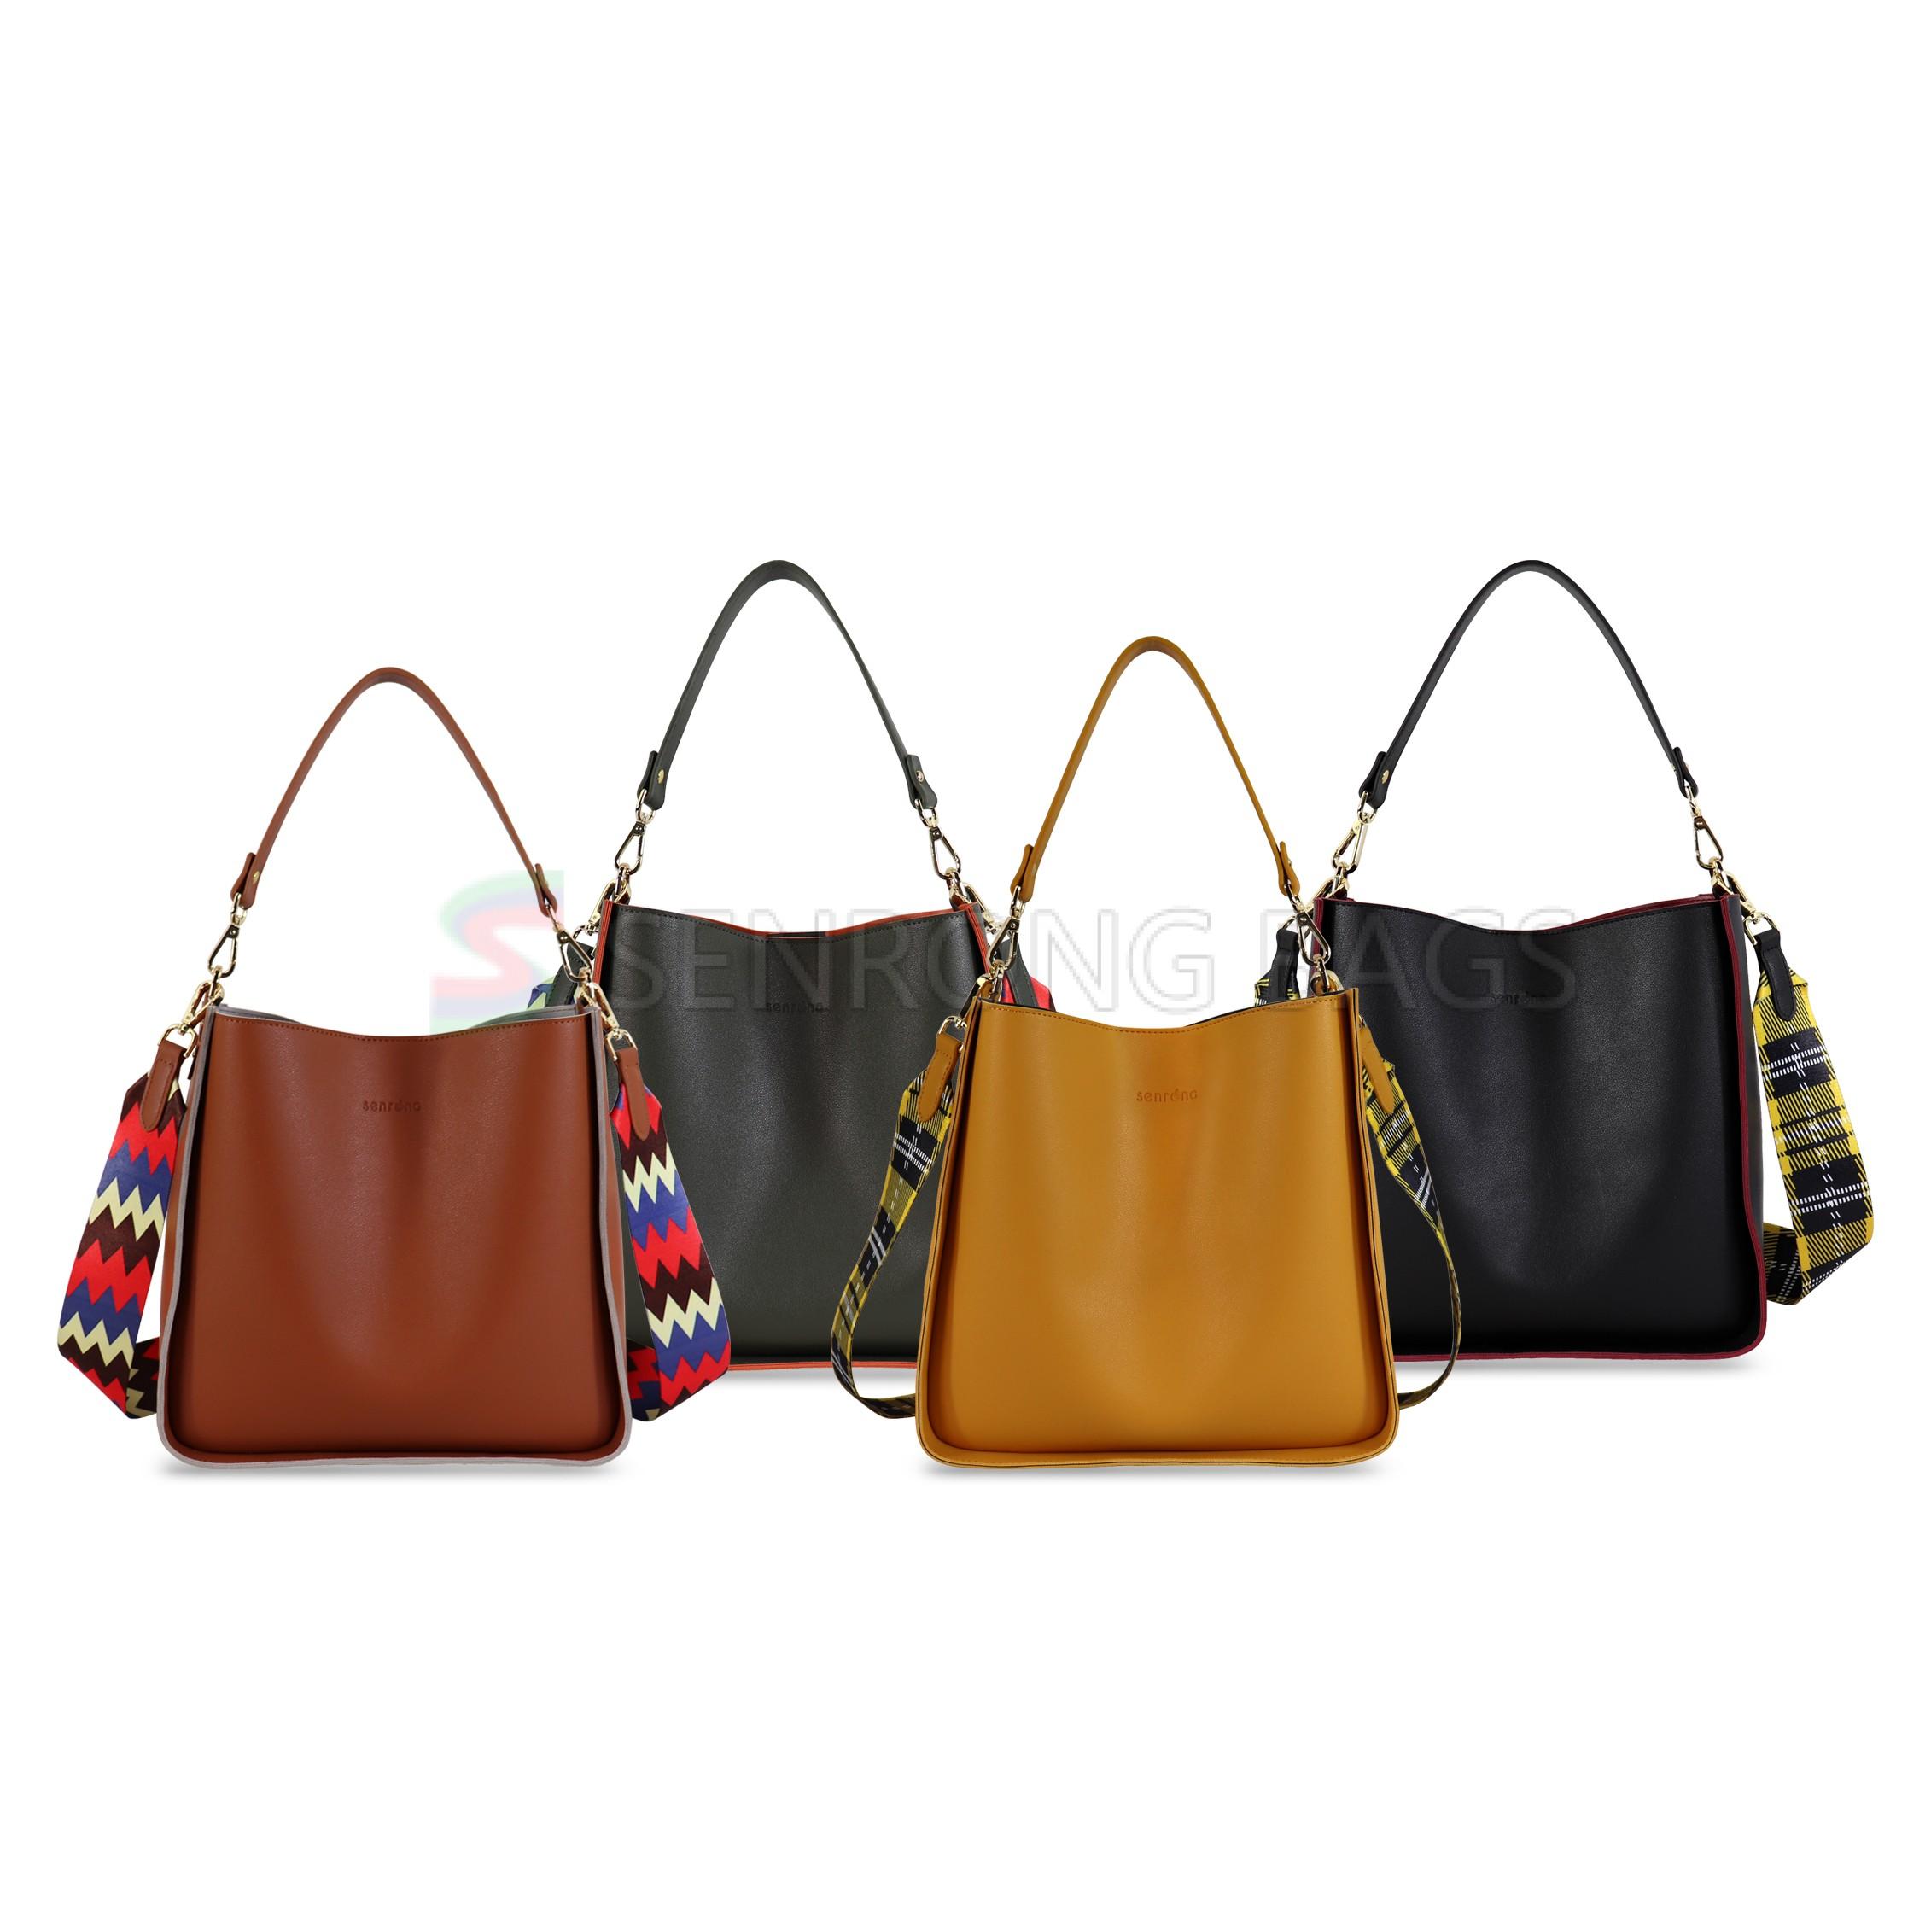 PU水桶包 PU Bucket Bag SRP18-017B to  SRP18-017Y